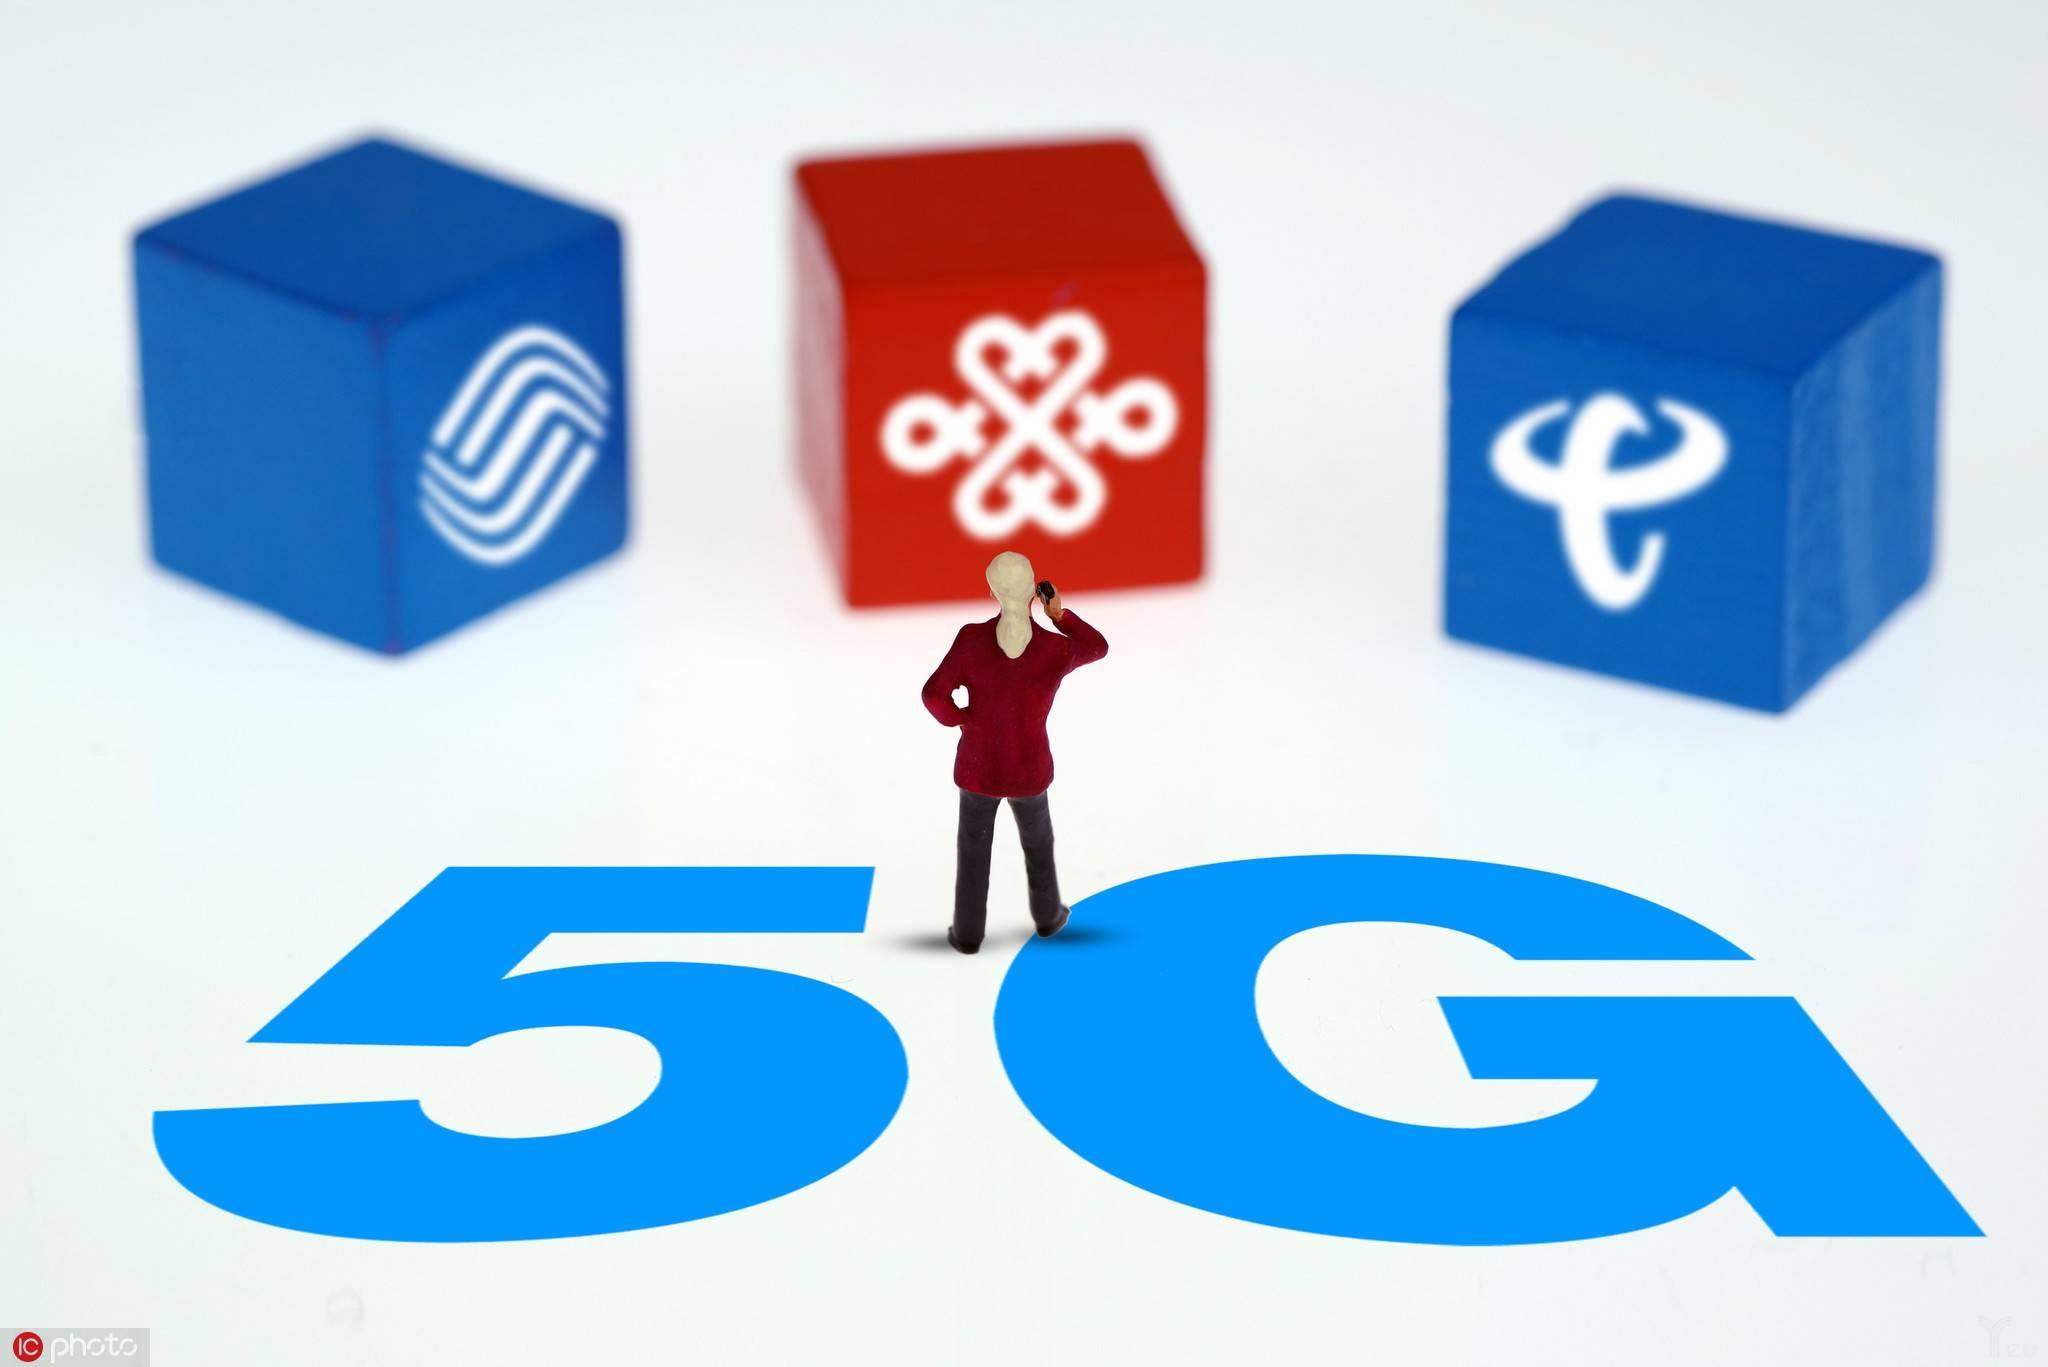 5G,5G网络切片,运营商,电信,低价竞争,降费提速